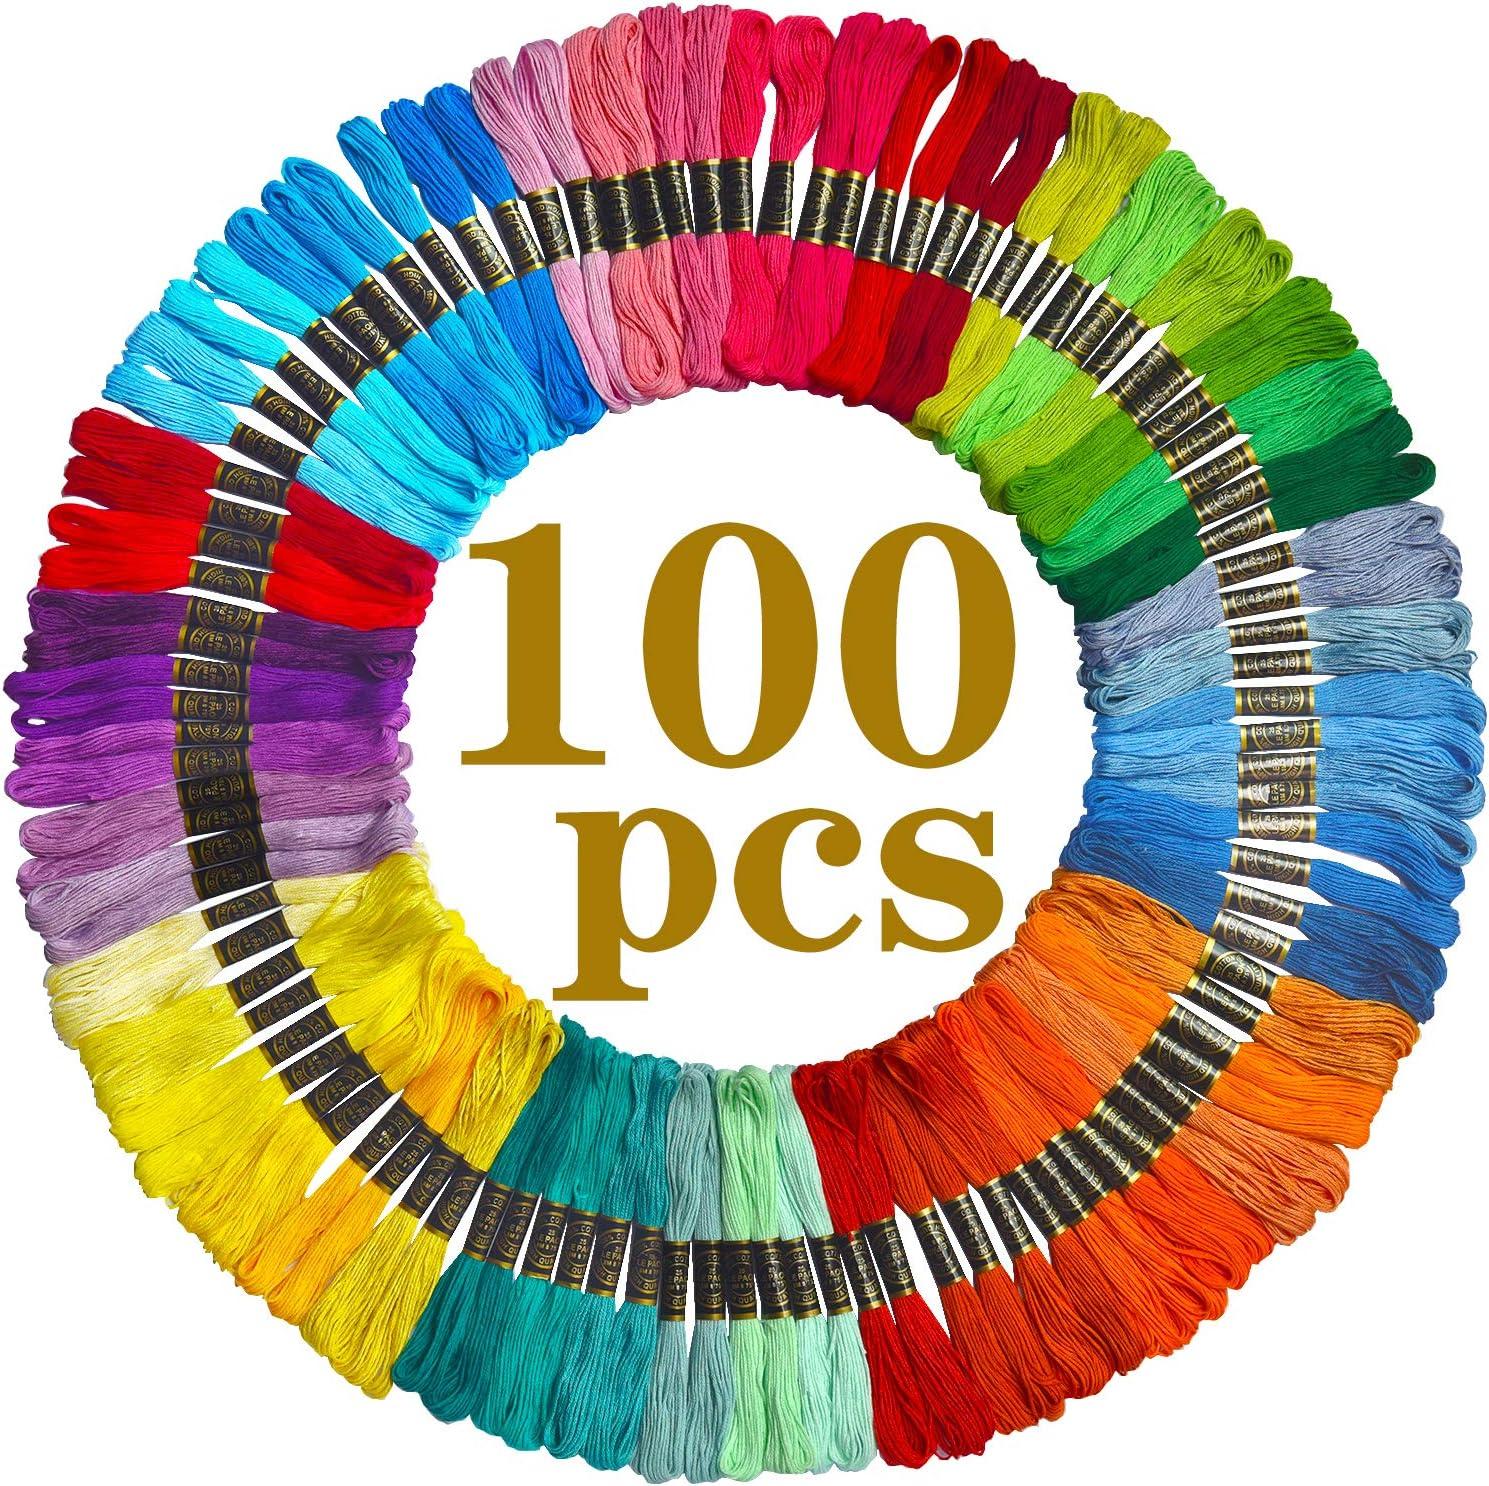 Cross Stitch Threads Premium Rainbow Color Embroidery Floss 136 Skeins Per Pack Crafts Floss Friendship Bracelets Floss